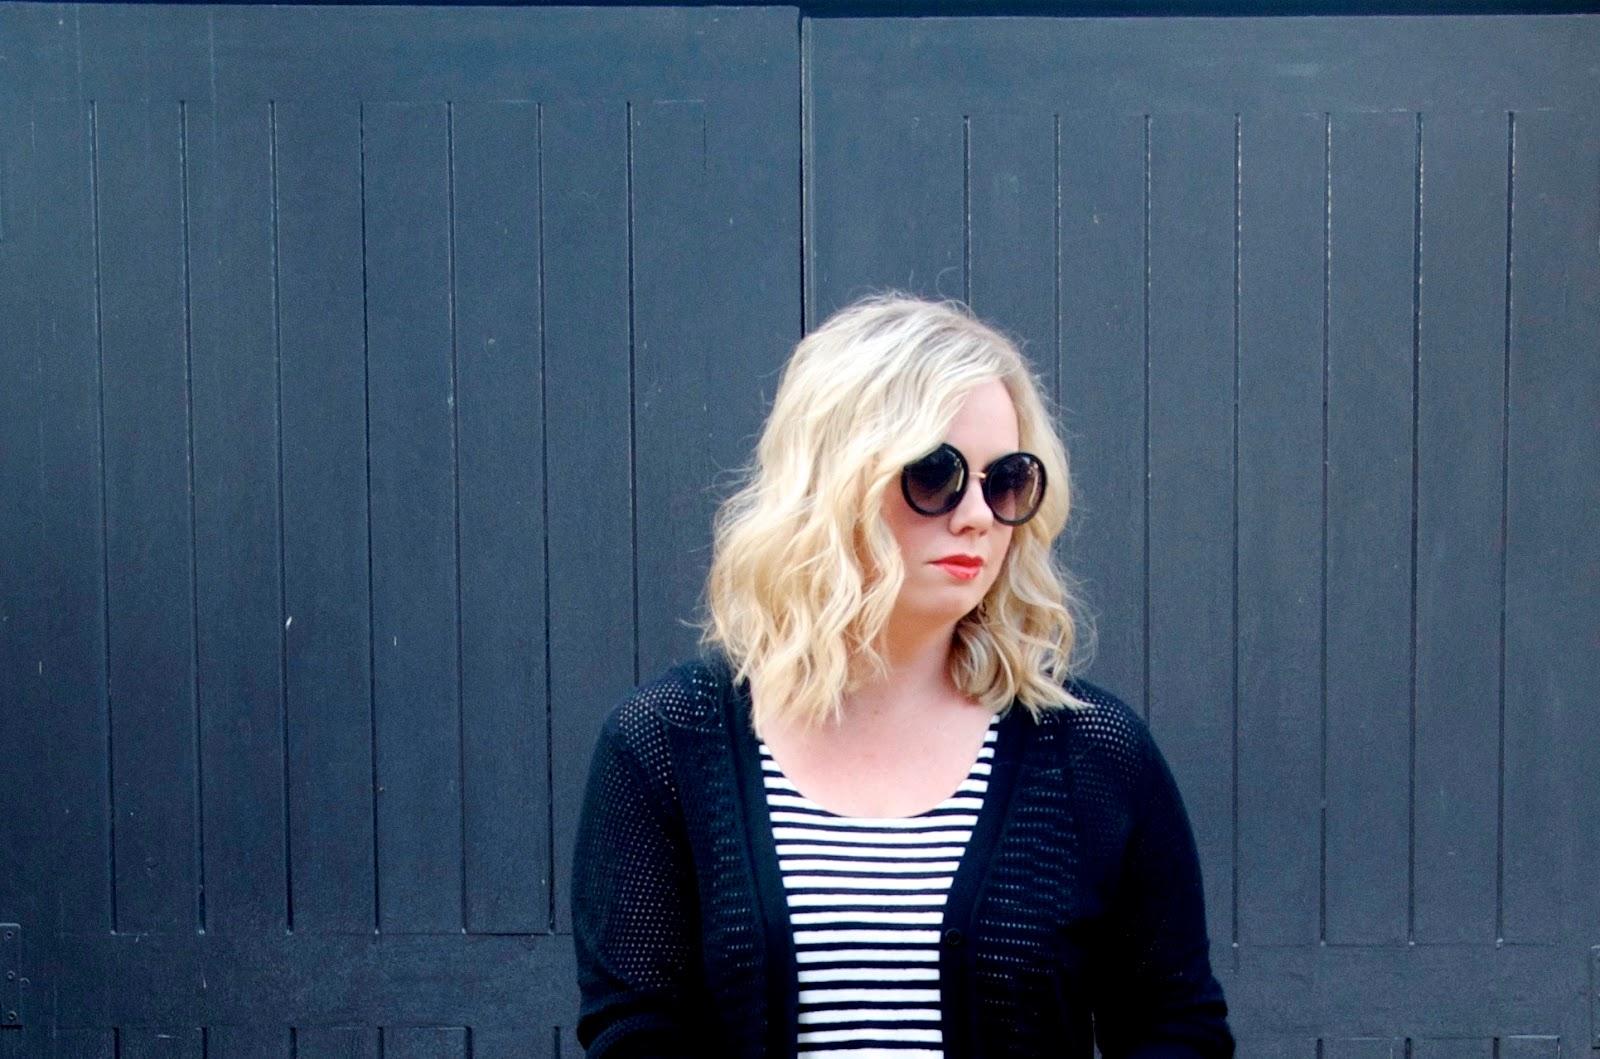 blonde bob, round sunglasses and stripes